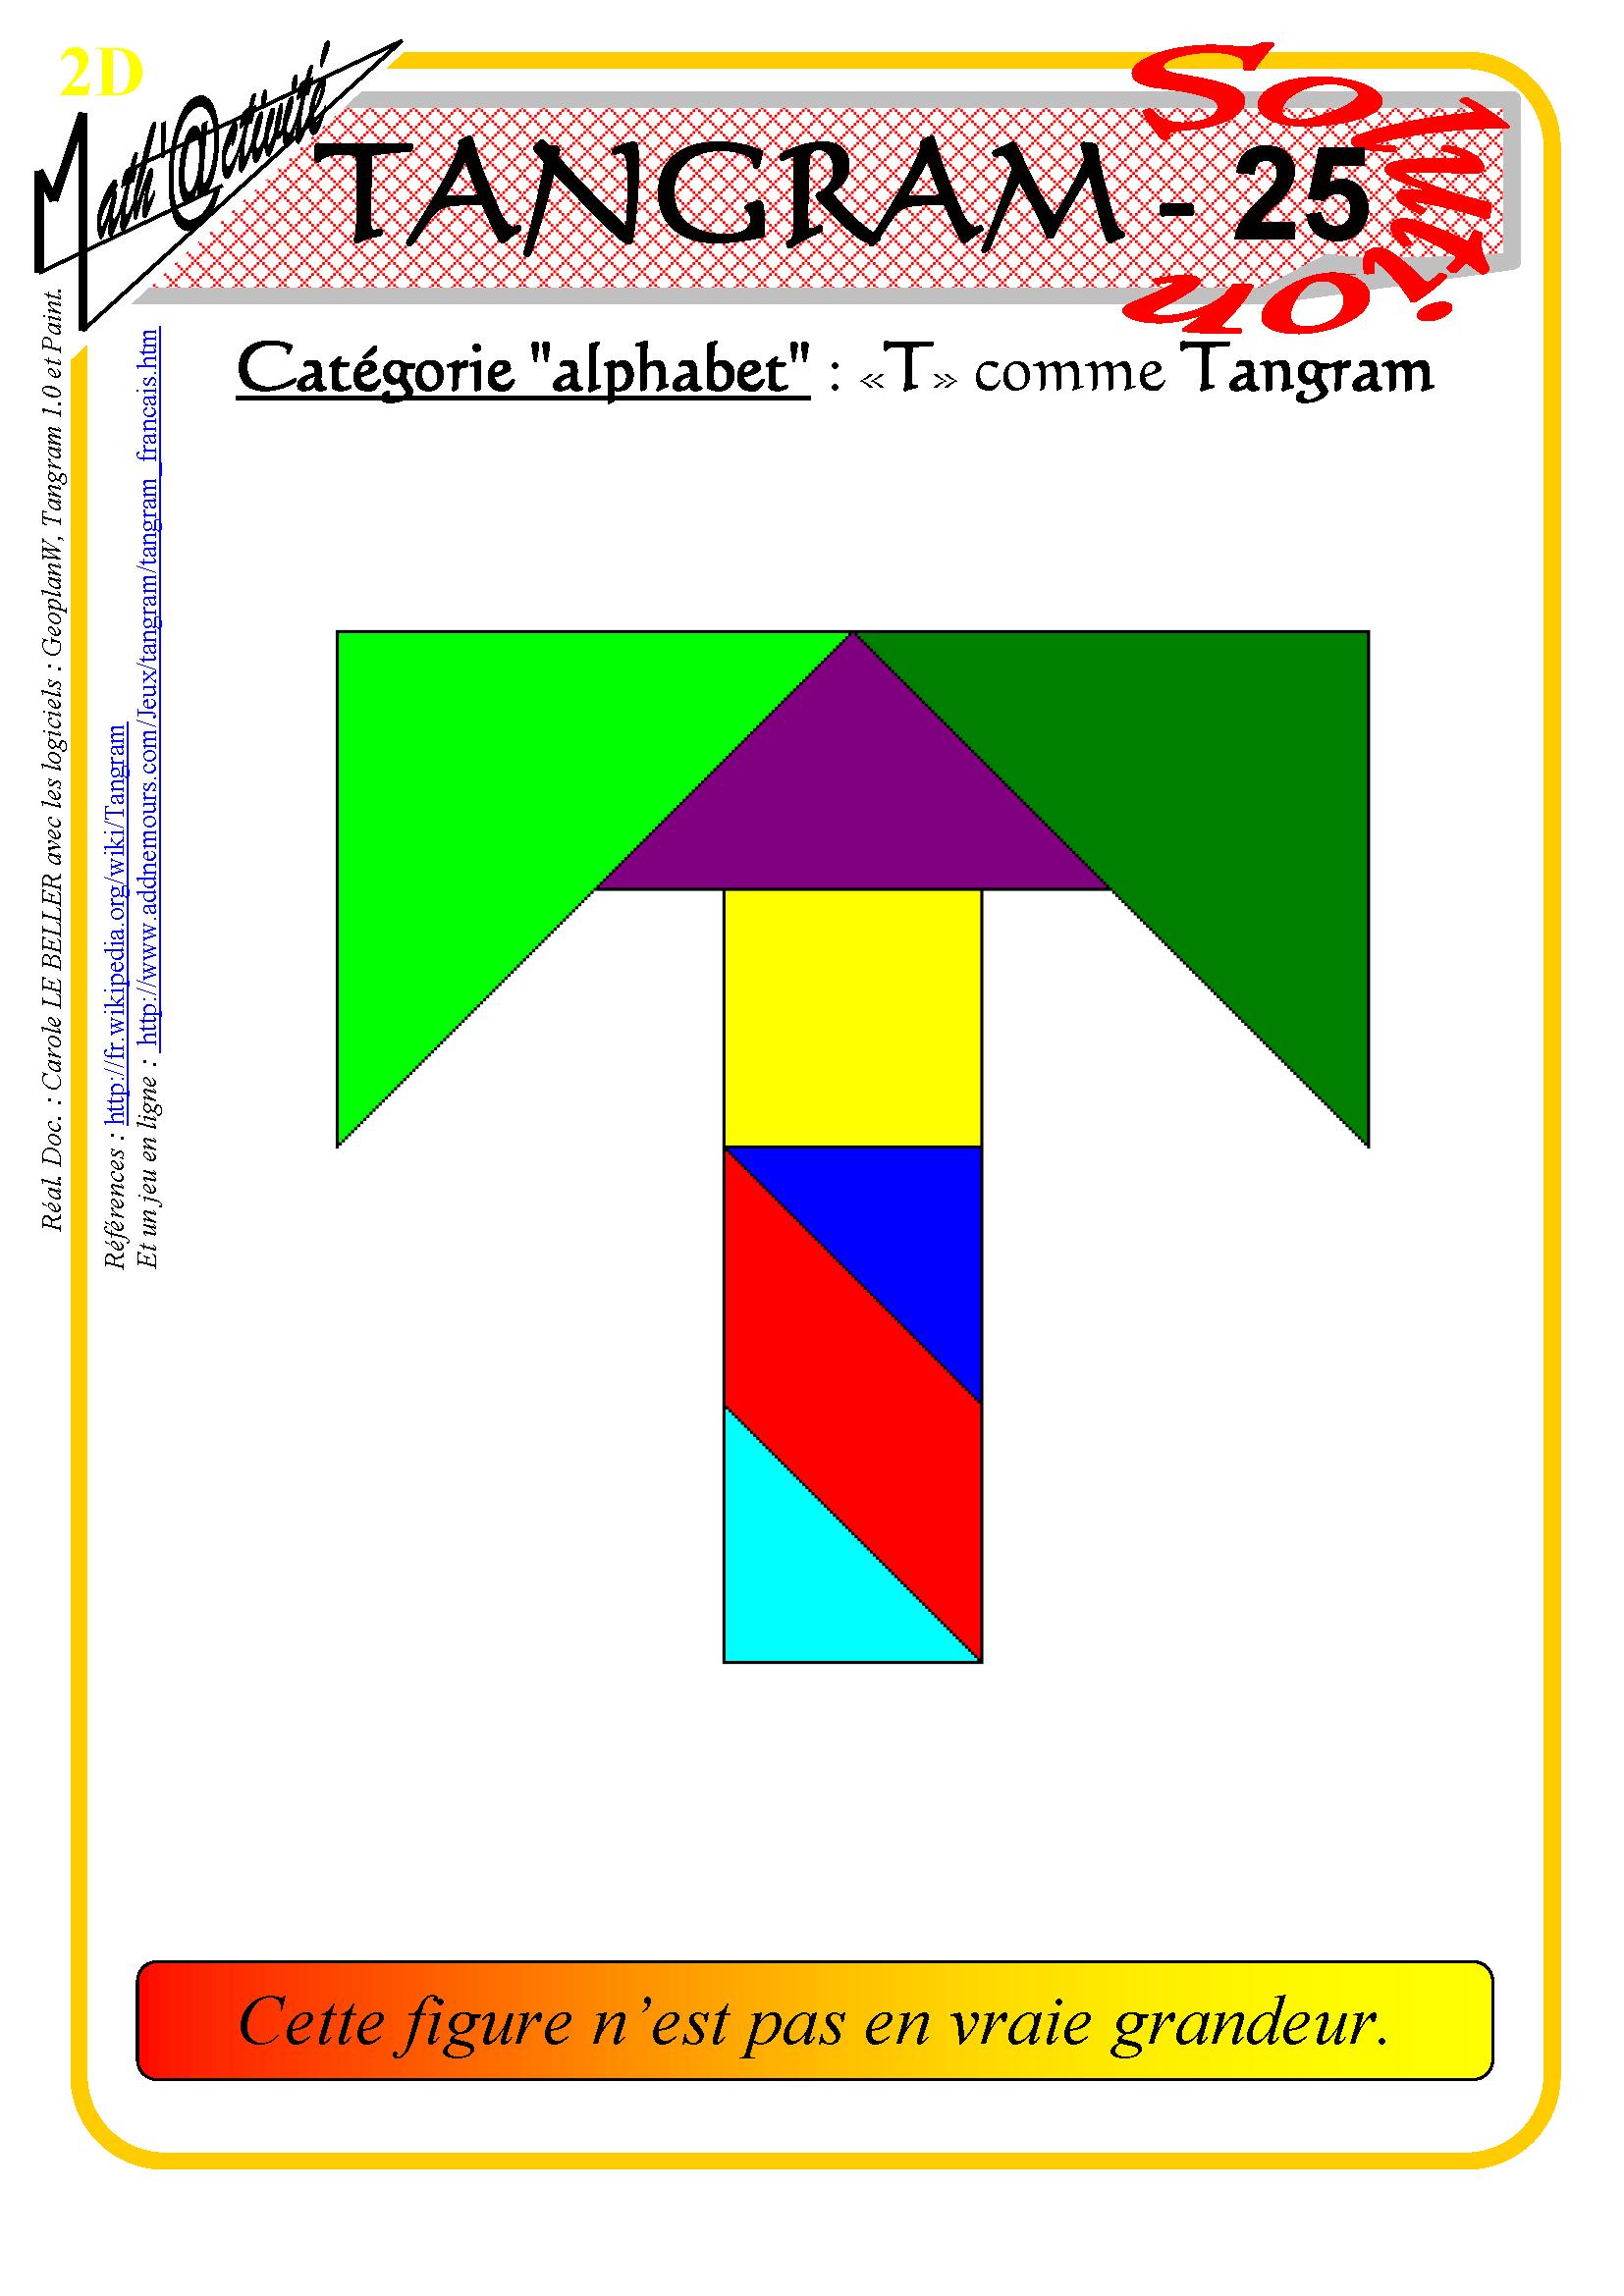 Math'@ctivité 2D : Tangram concernant Jeu De Tangram À Imprimer